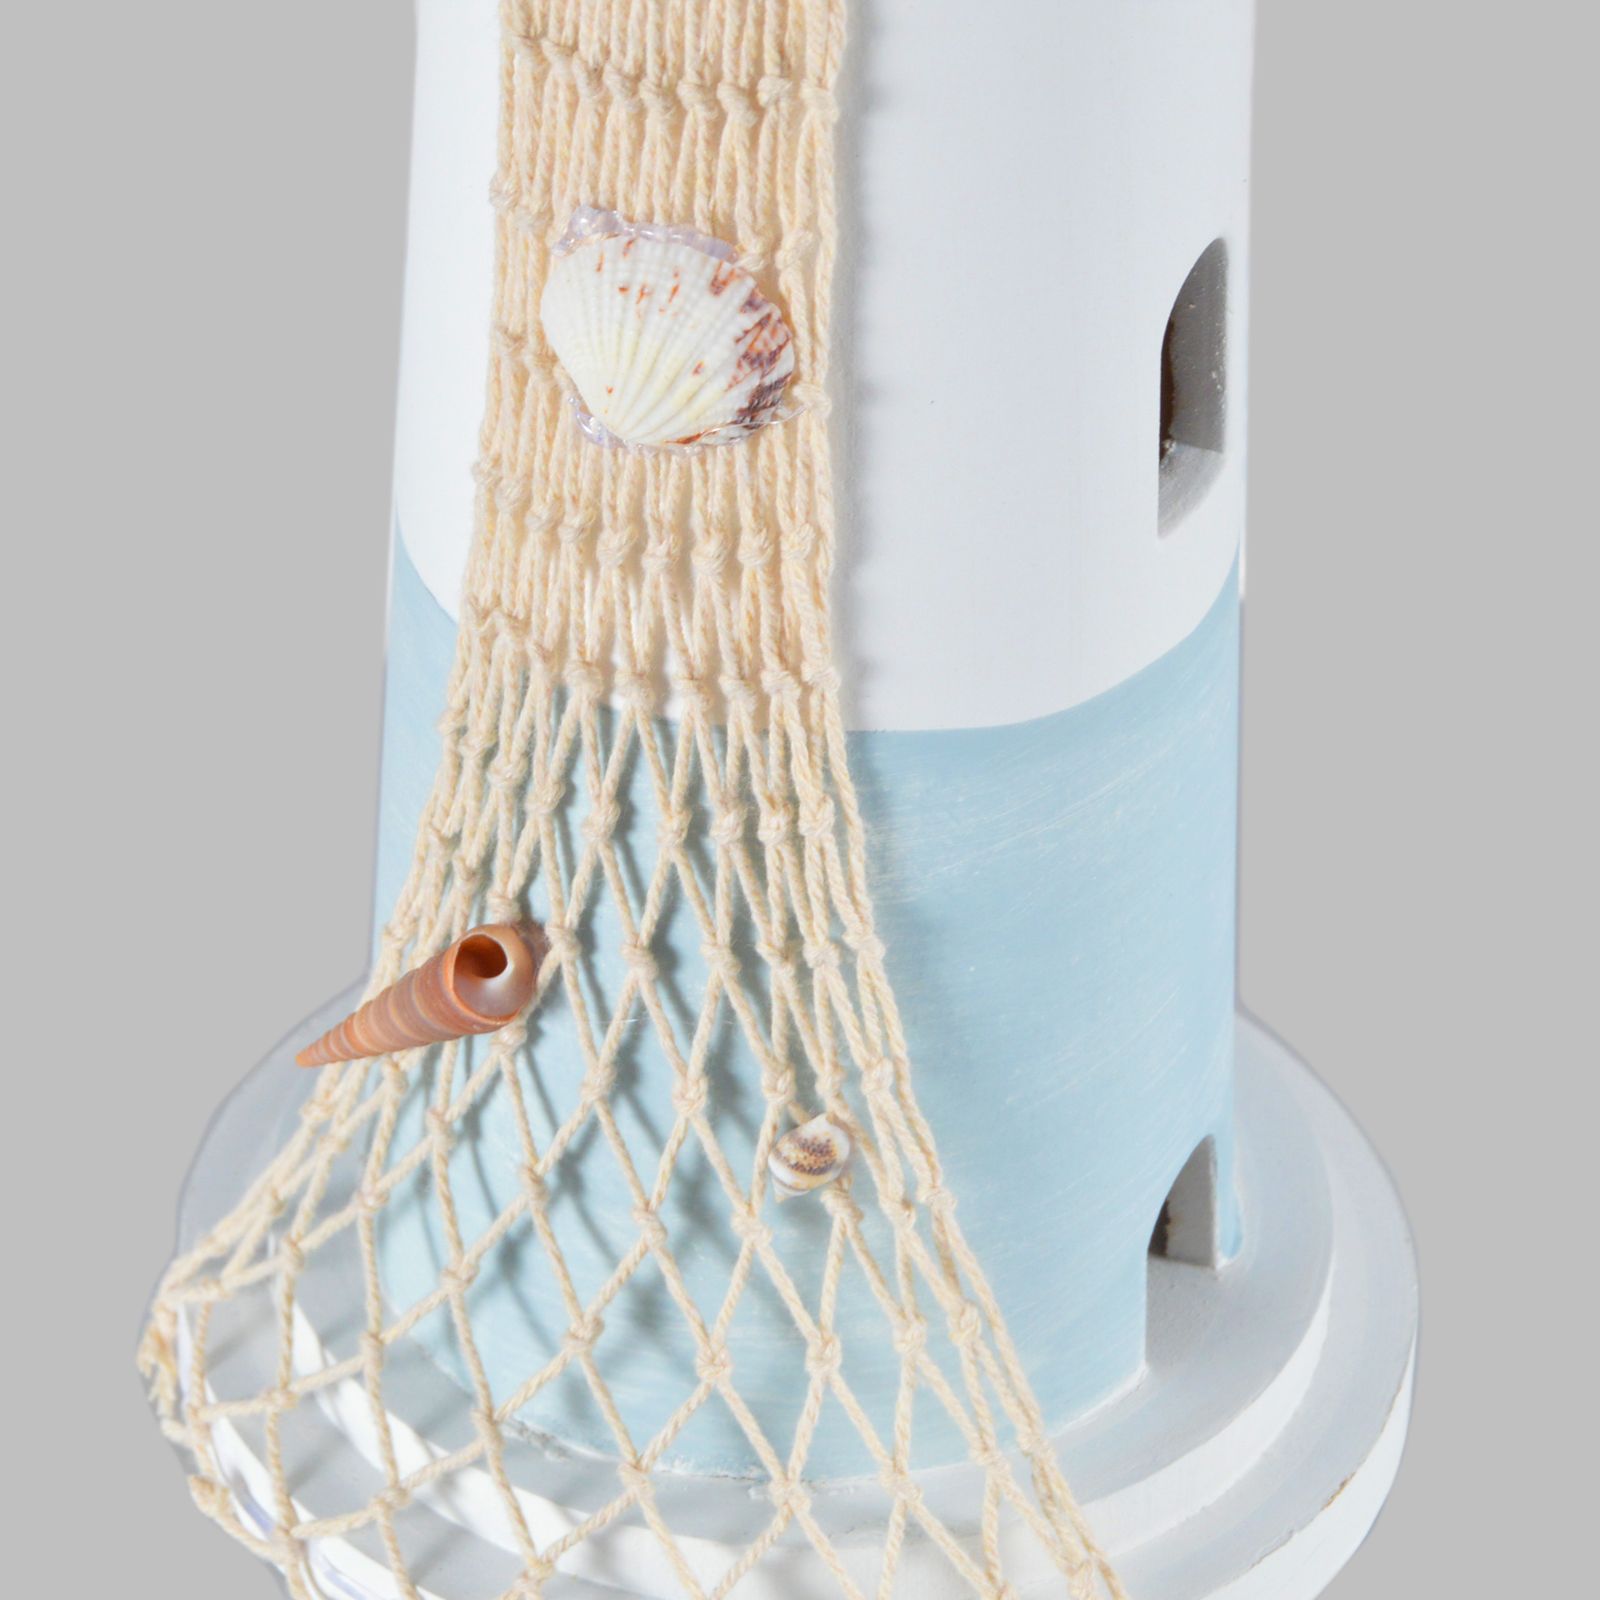 Leuchtturm Holz Deko Strand Meer Dekoration Badezimmer